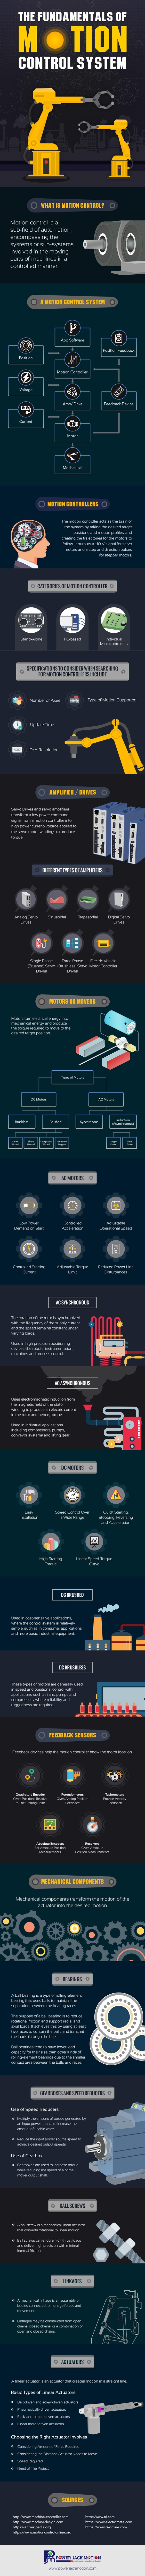 Fundamentals-of-Motion-Control-System.jpg